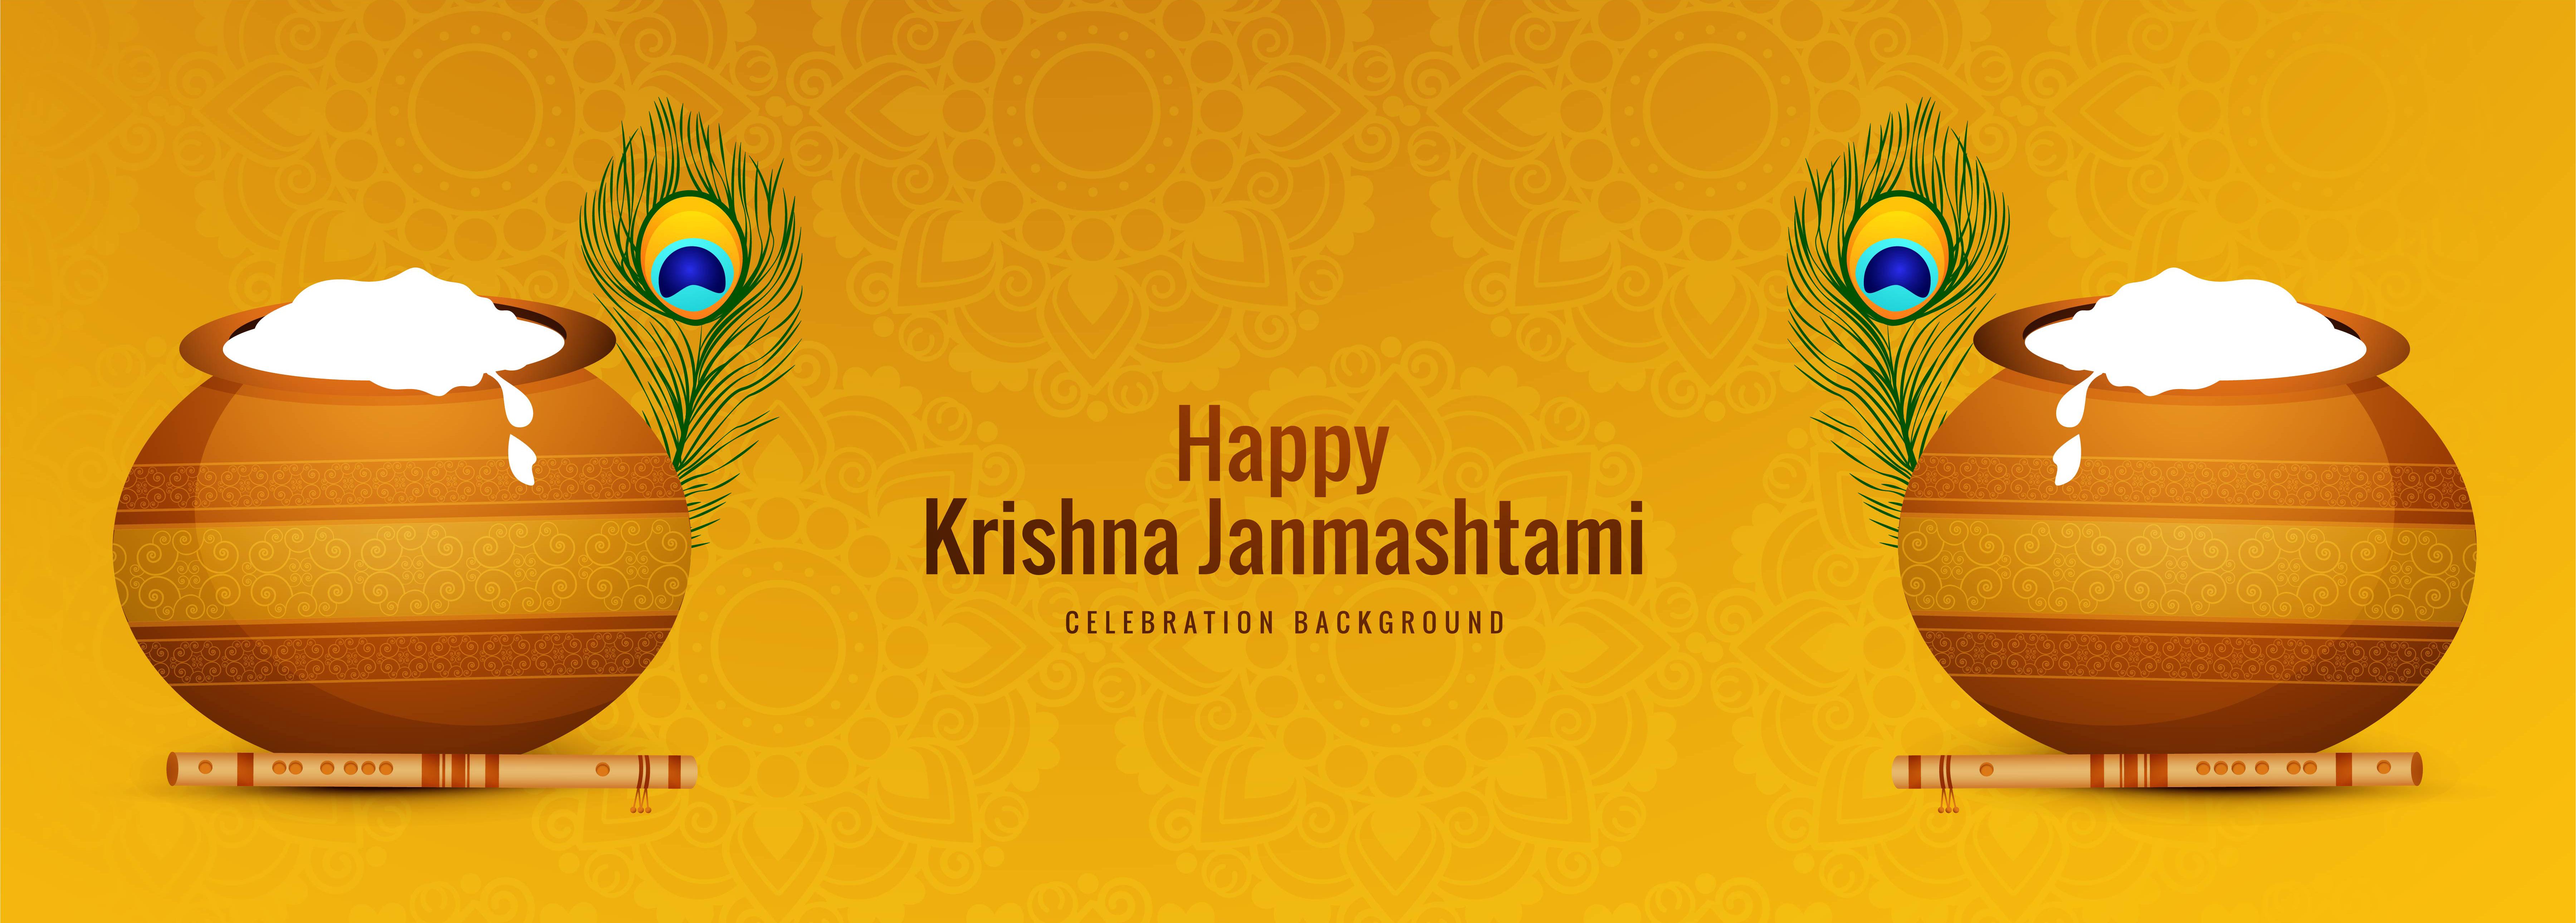 feliz celebración janmashtami tarjeta de banner religioso